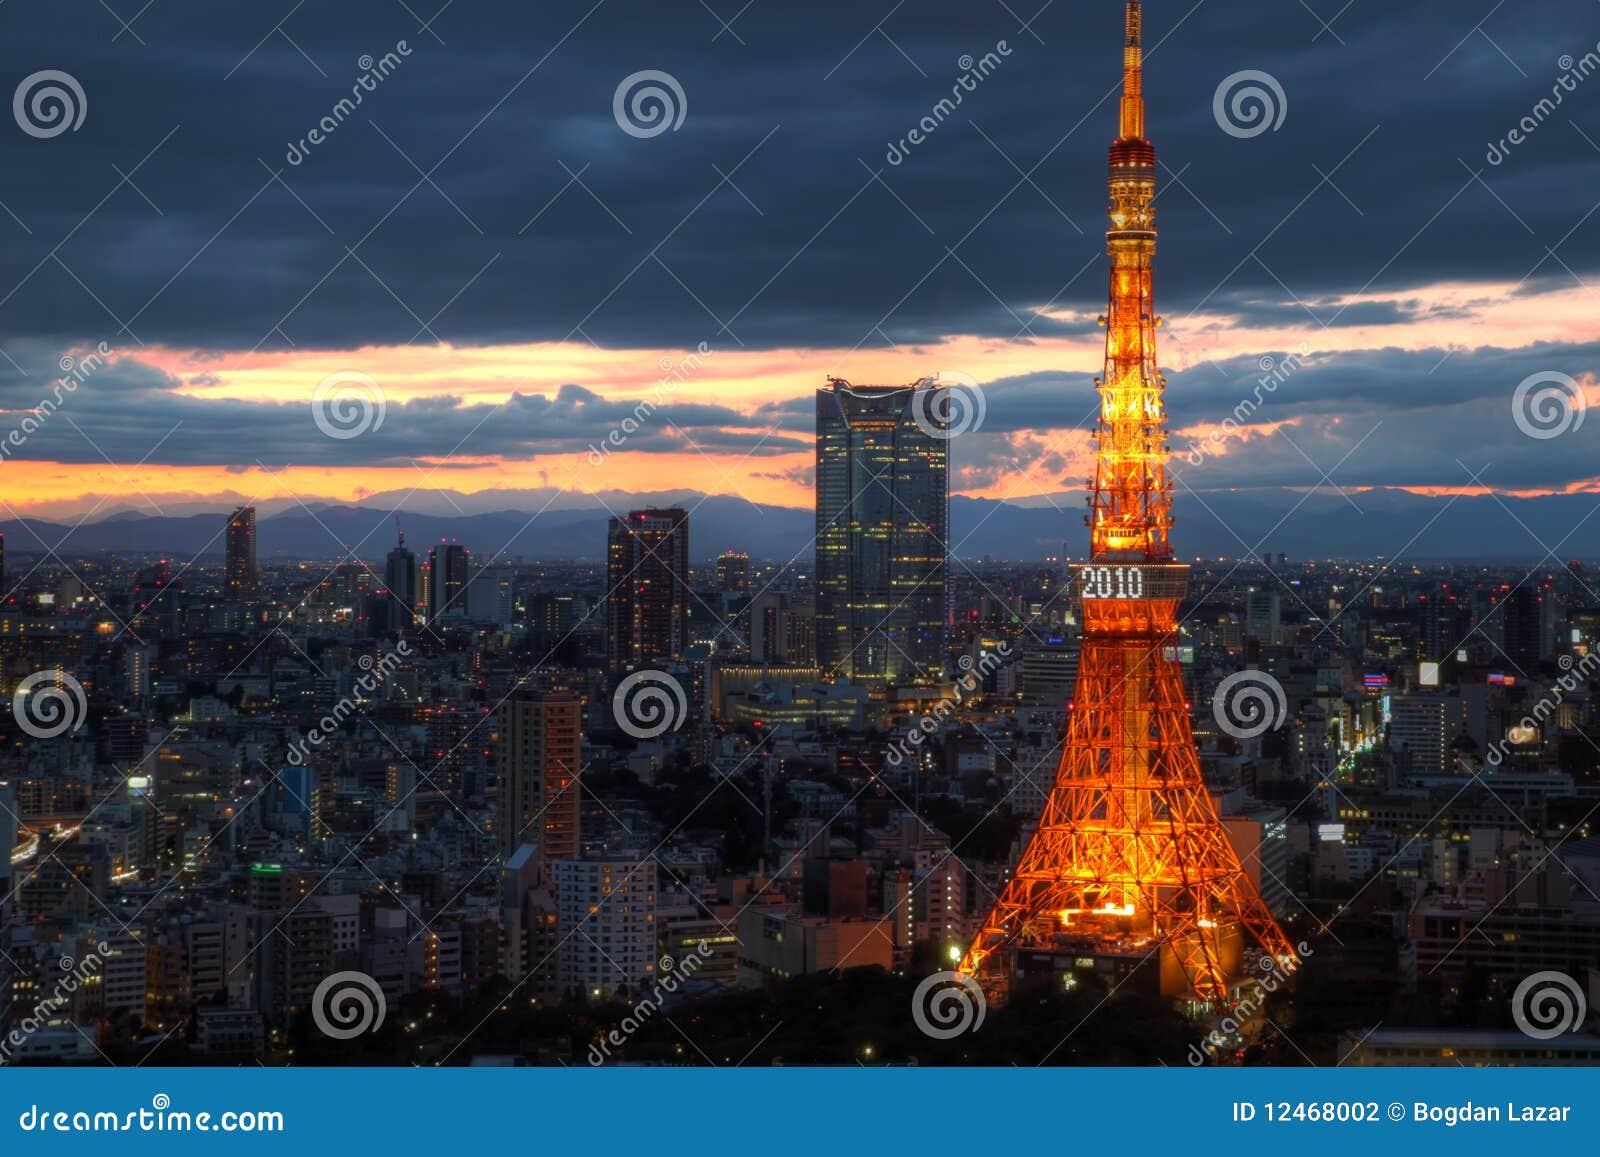 Japan horisonttokyo torn 2010